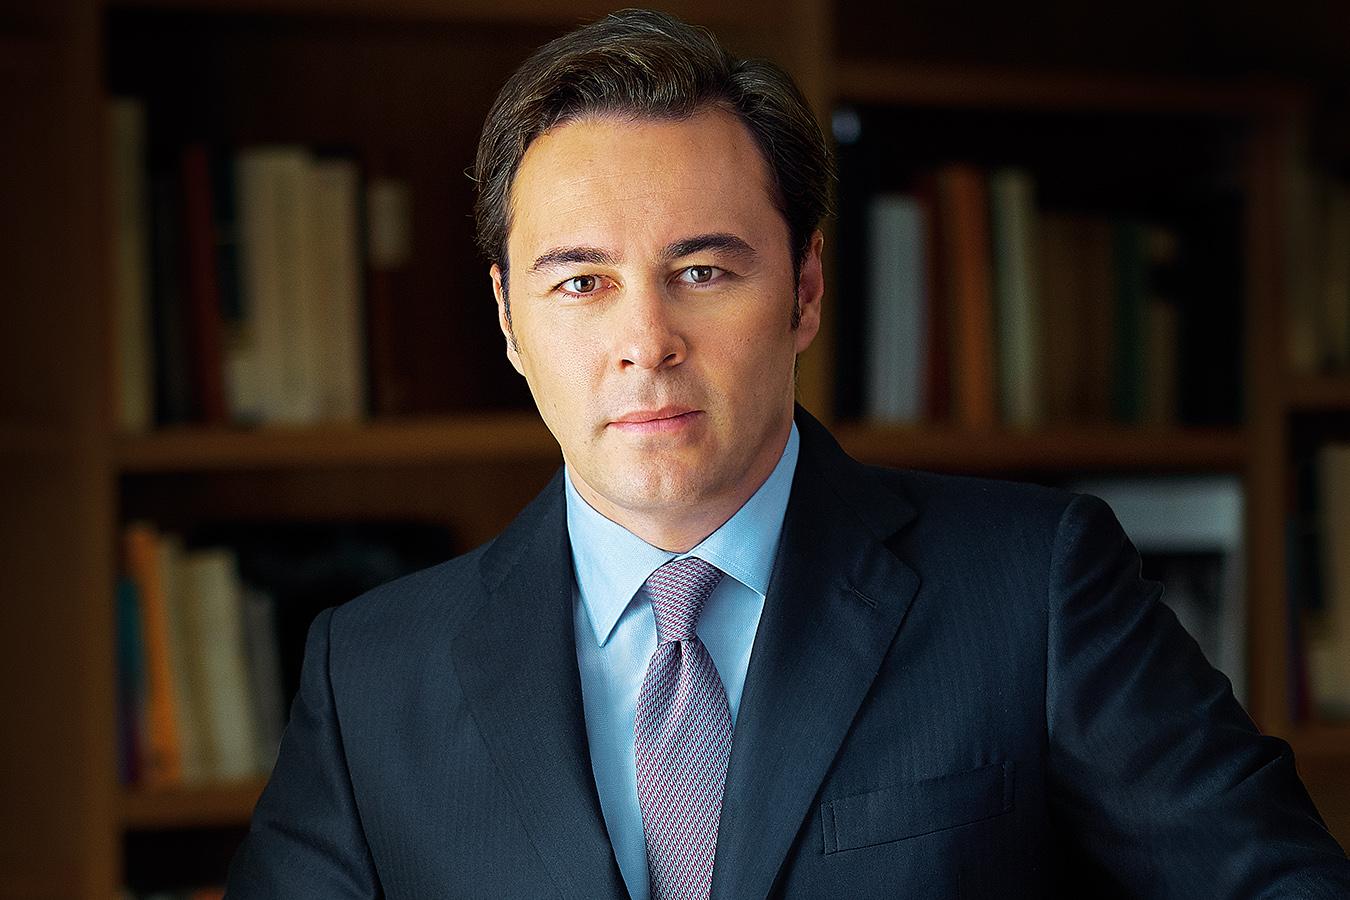 El Corte Inglés Chairman Dimas GImeno Álverez